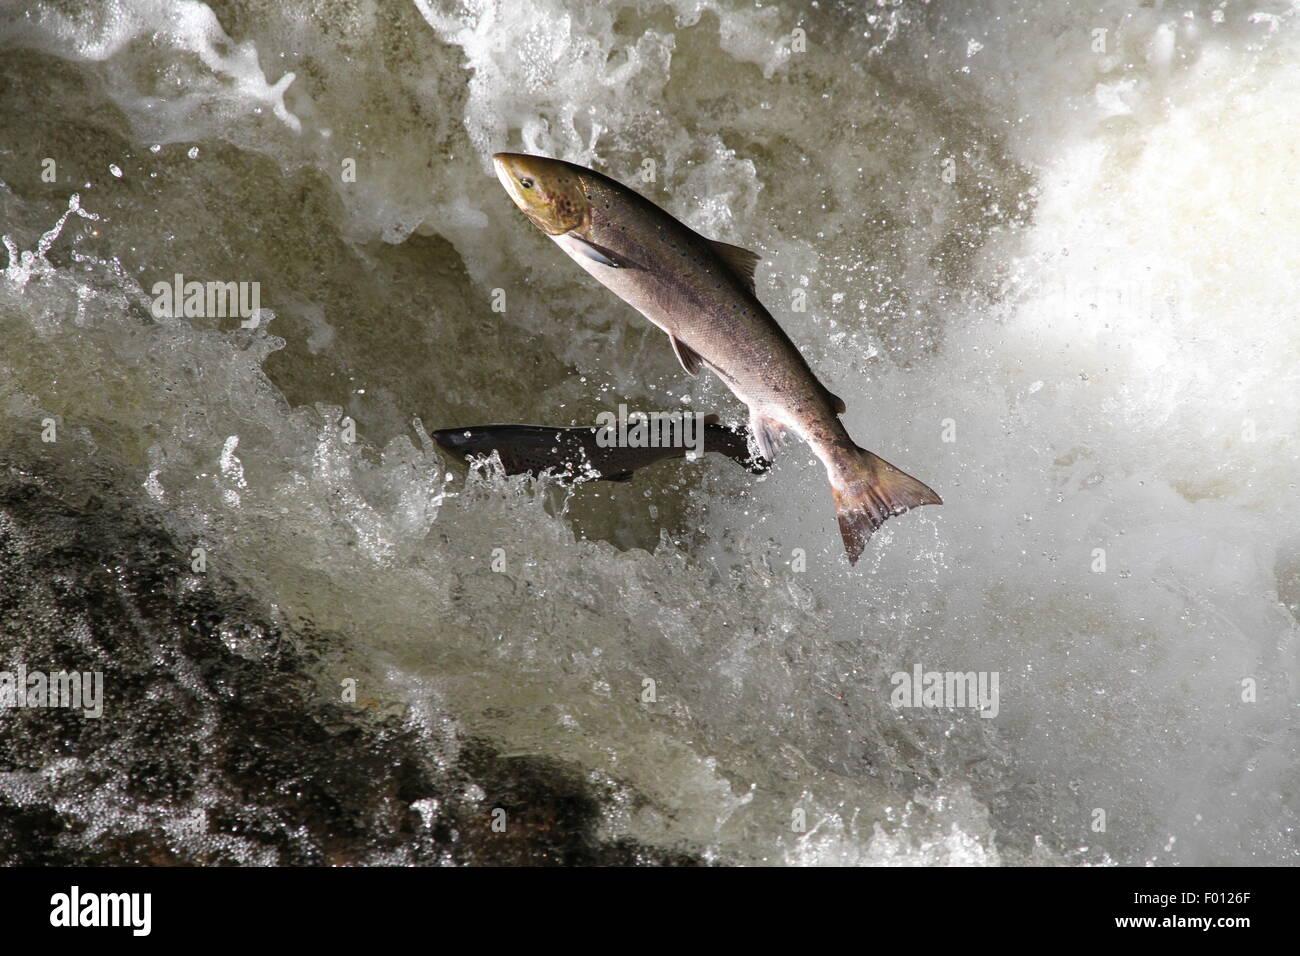 Scottish wild salmon leaping, River Almond, Perthshire, Scotland Stock Photo: 86075543